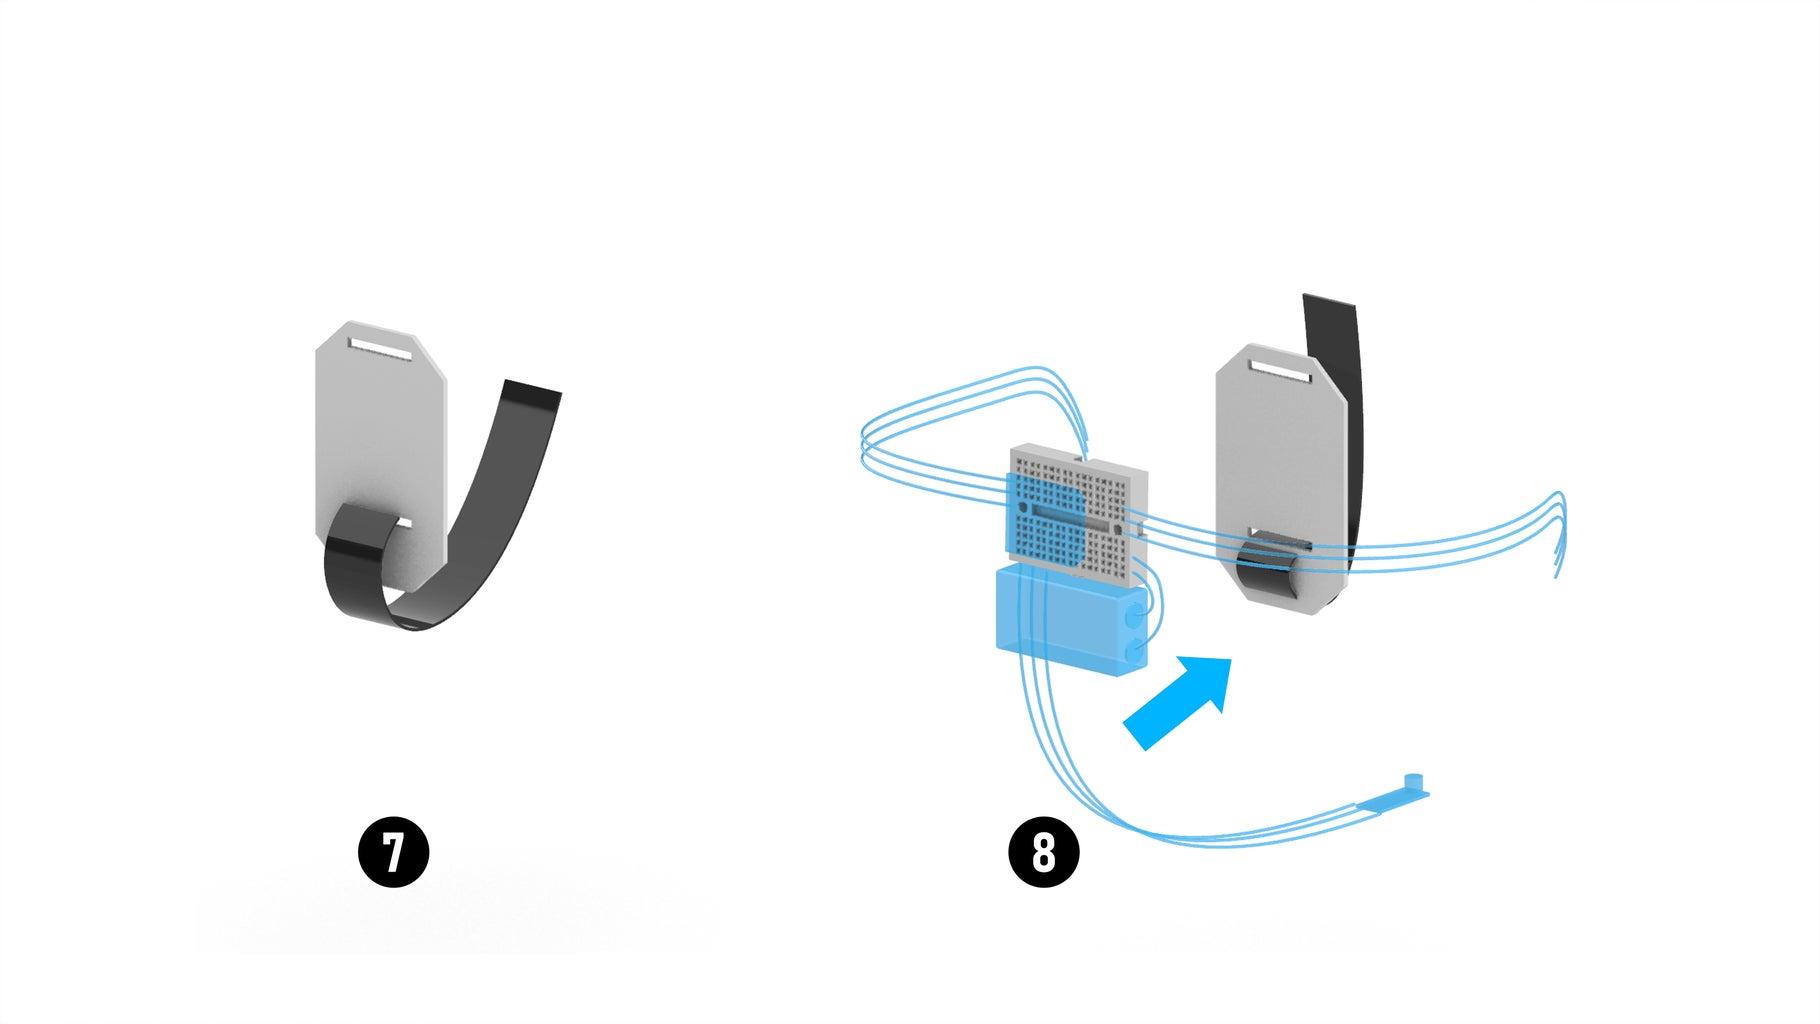 Assembling the Headband